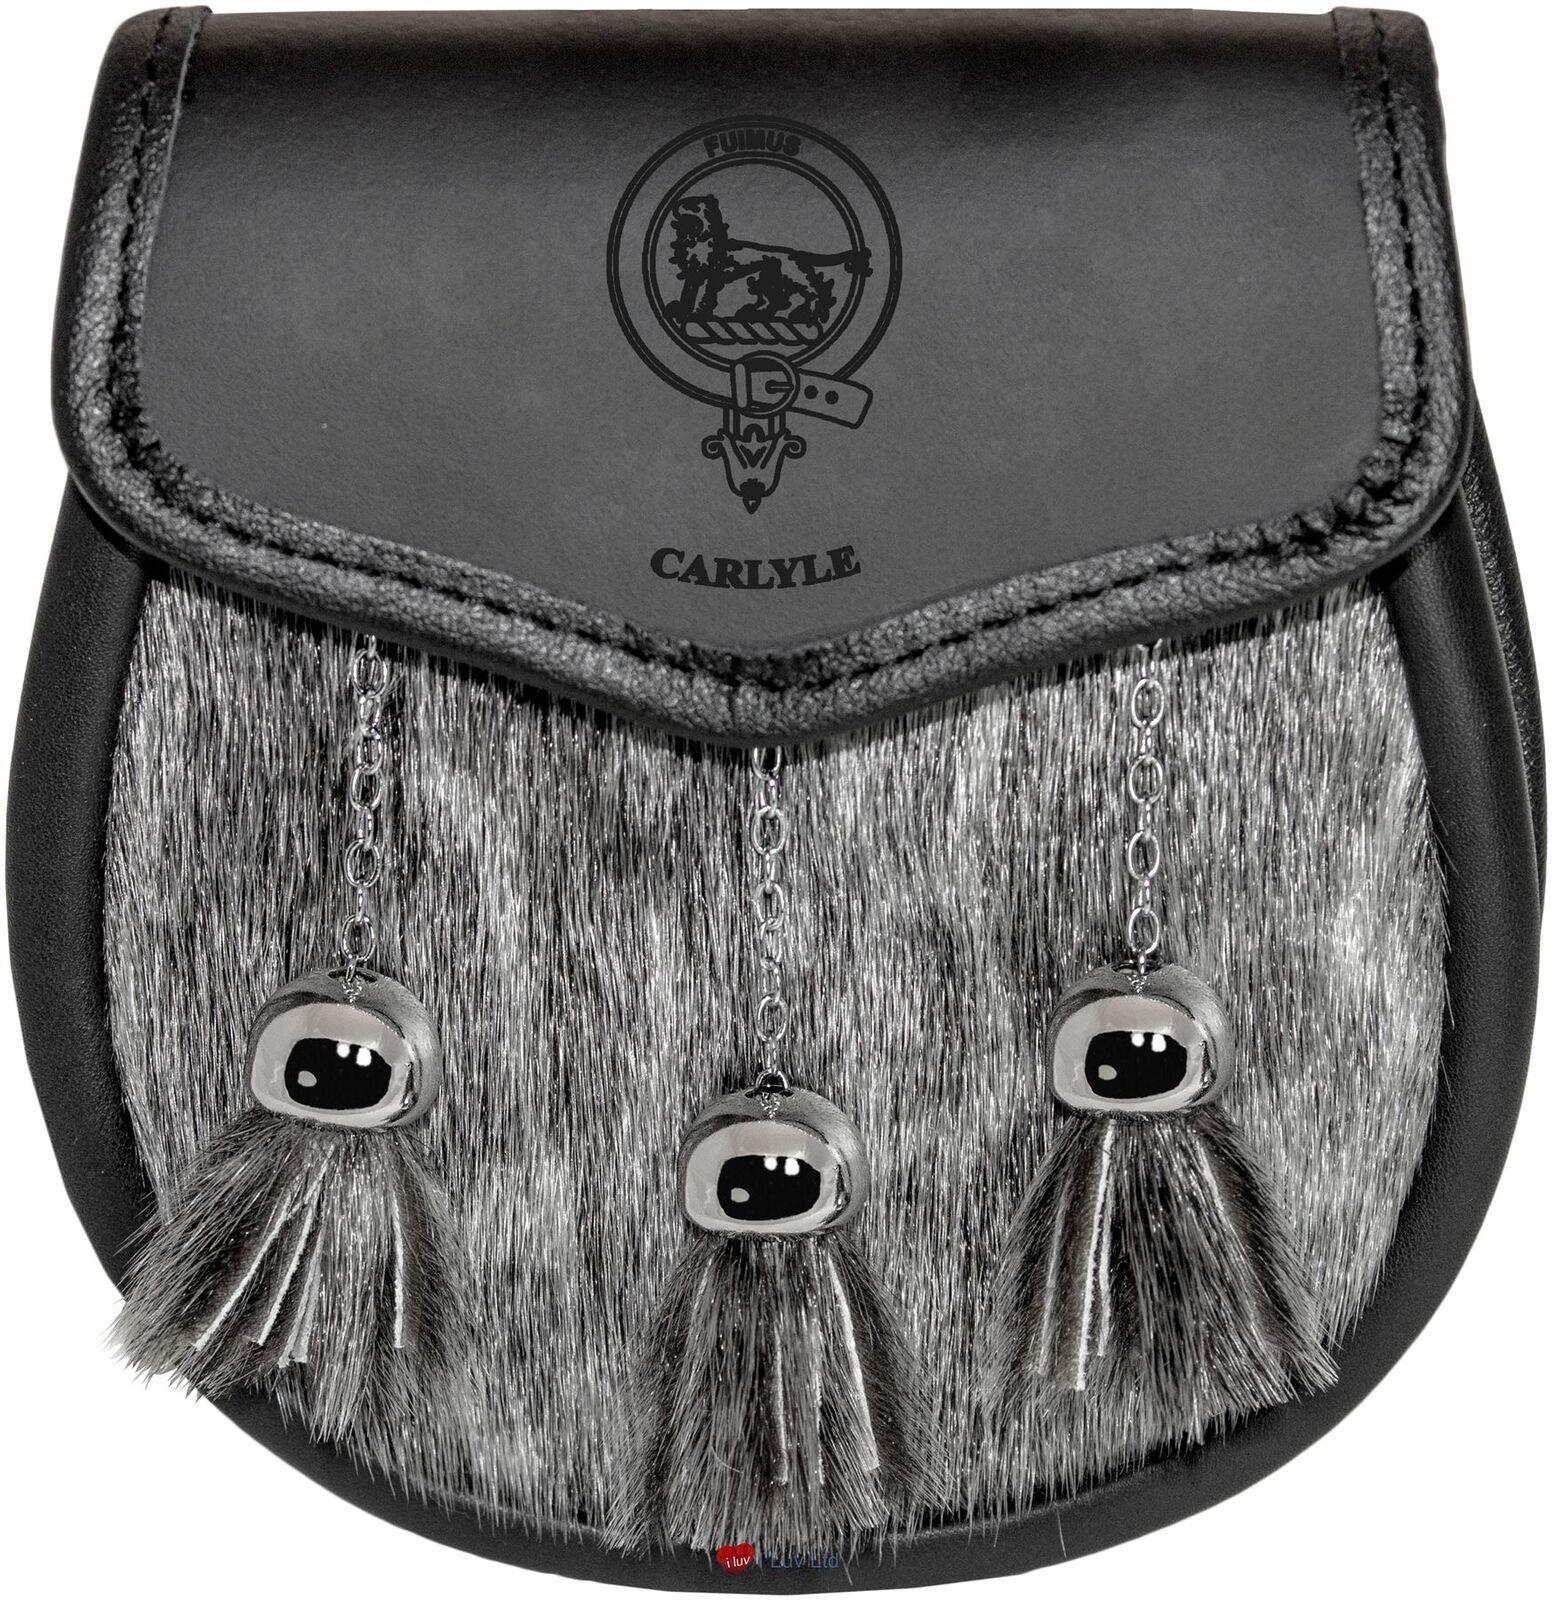 Carlyle Semi Dress Sporran Fur Plain Leather Flap Scottish Clan Crest